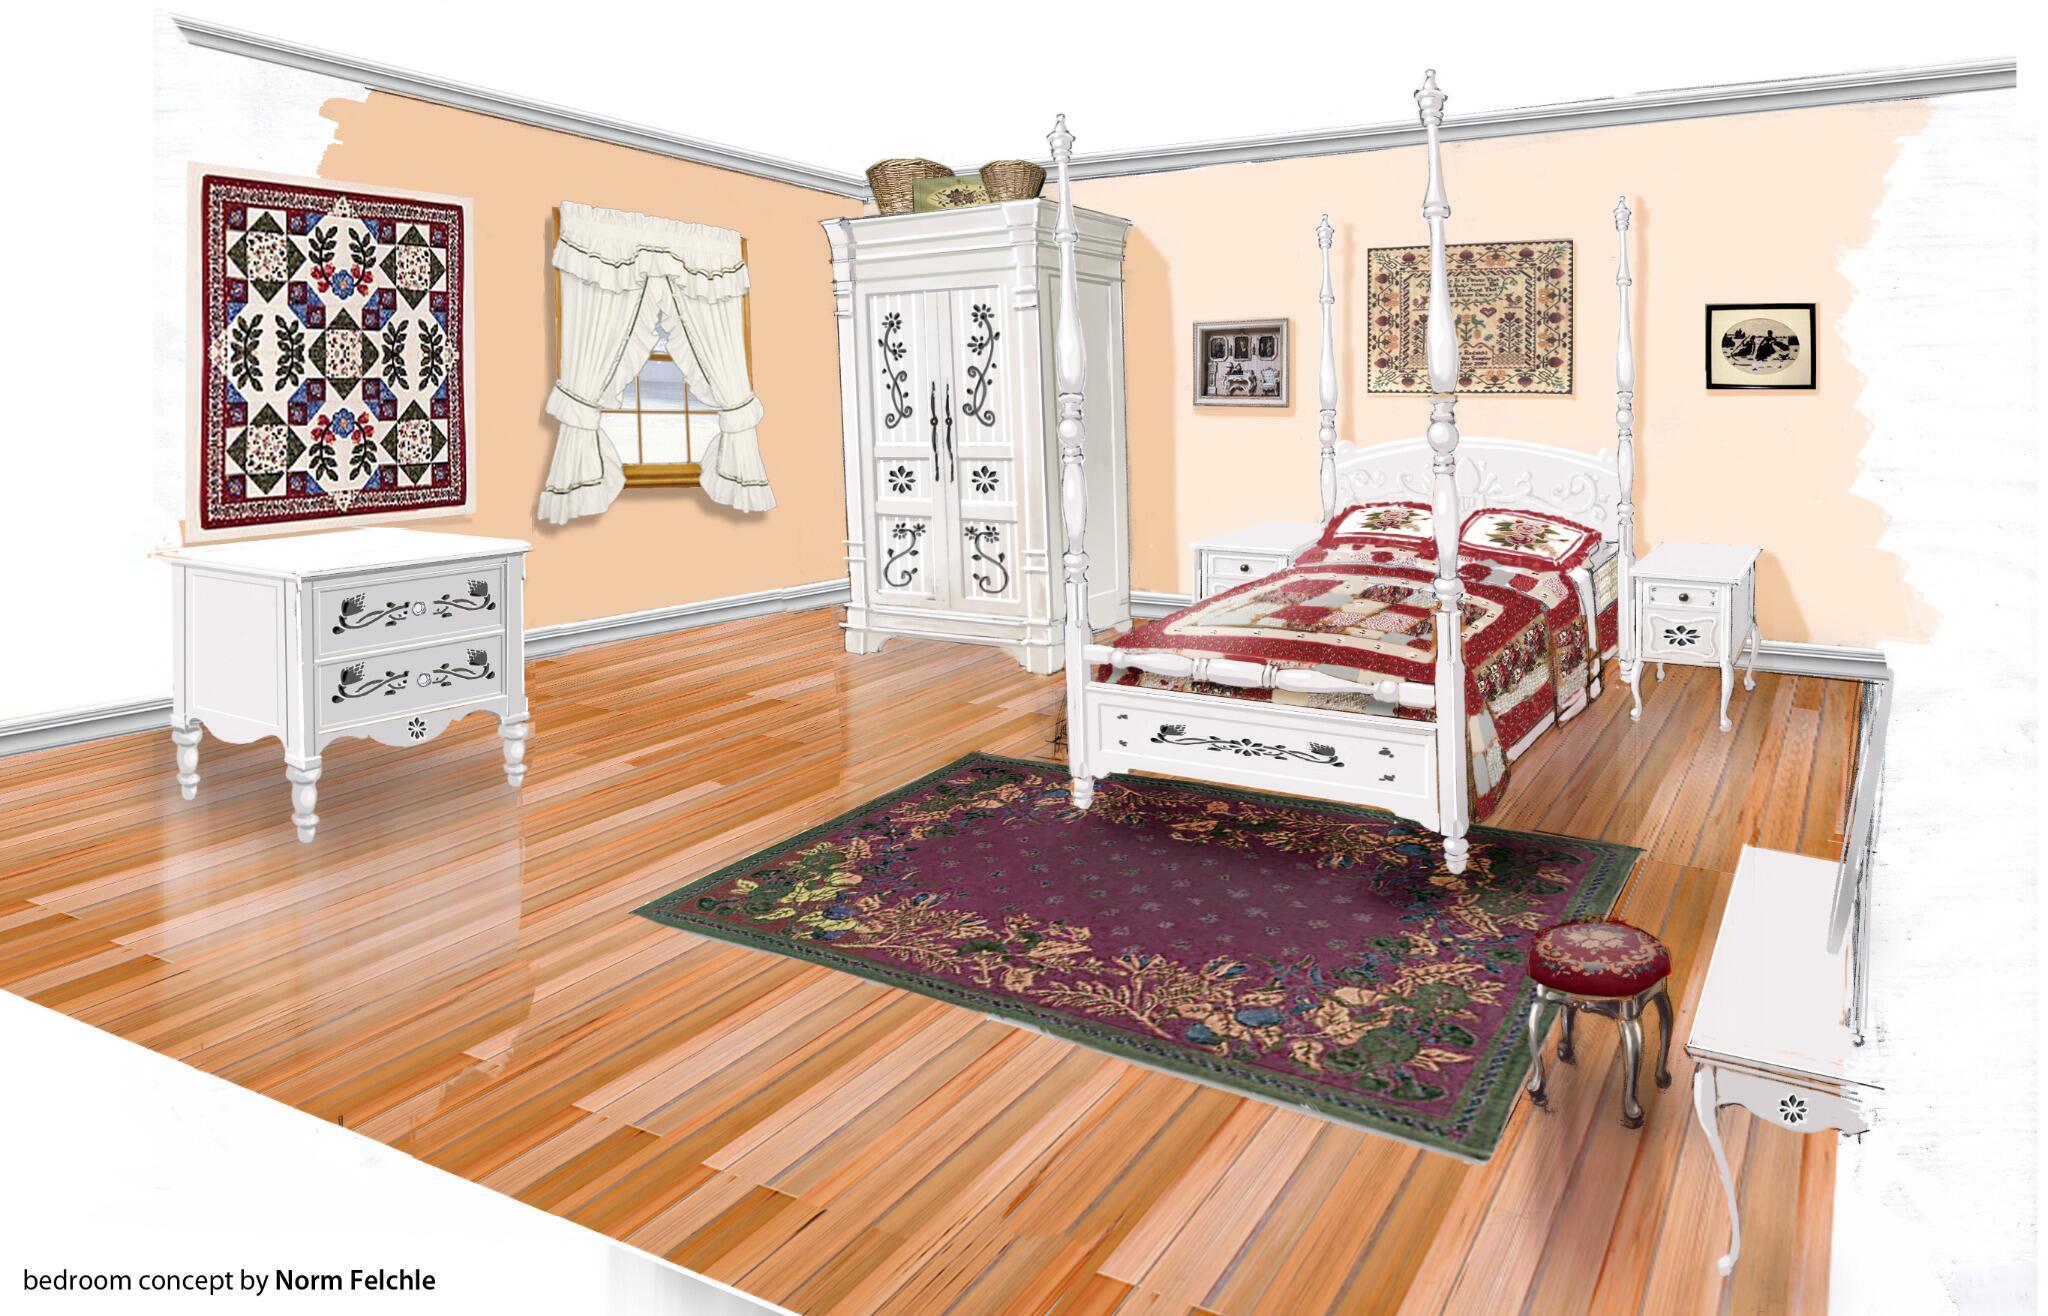 [imagen]Arte conceptual Los sims 3: Dormitorio BhbCkGYCAAAiq-M